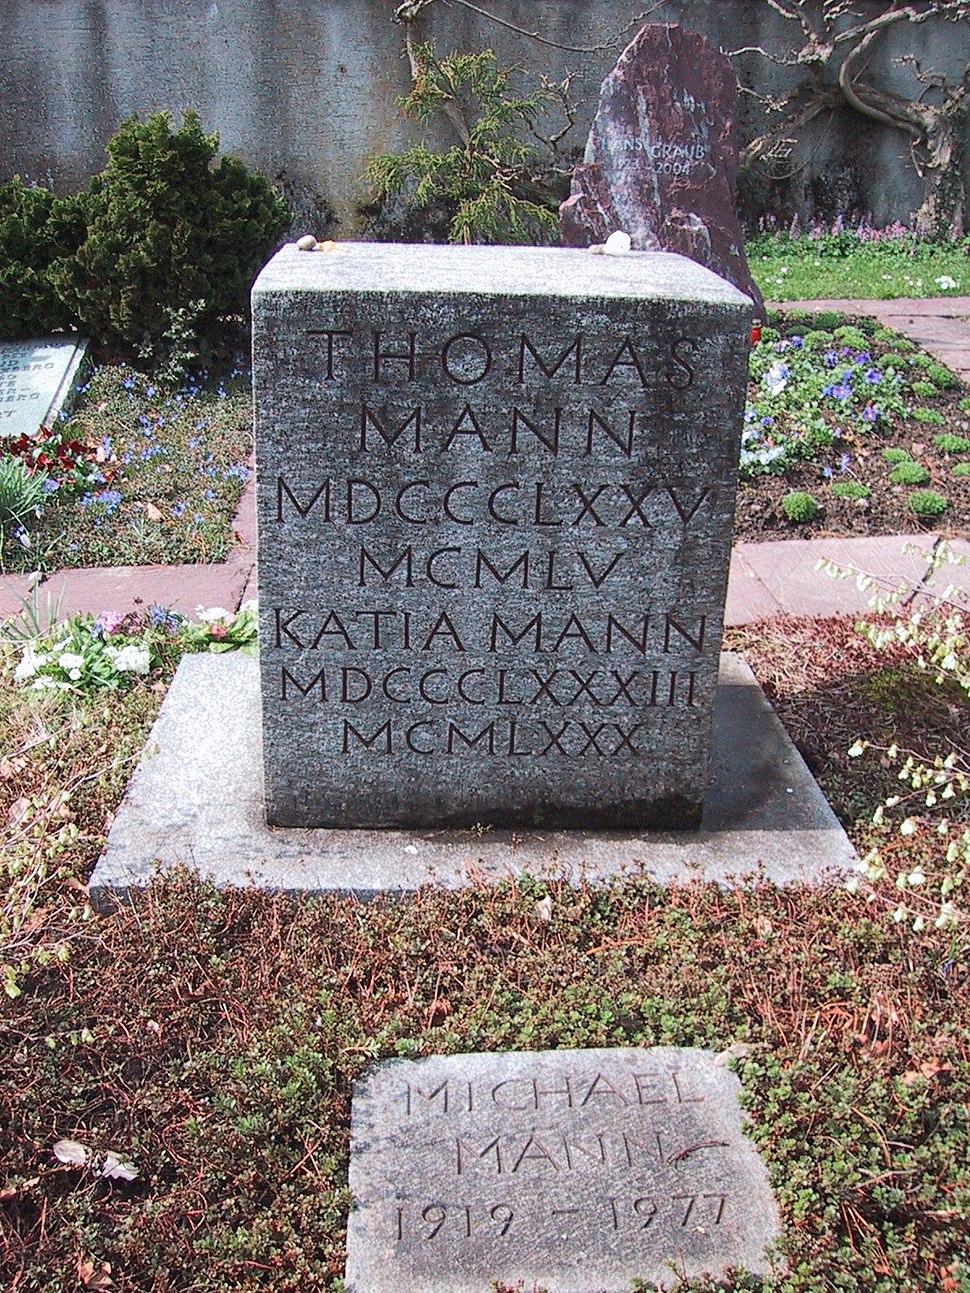 Thomas Mann Grave 2005-03-26.jpeg